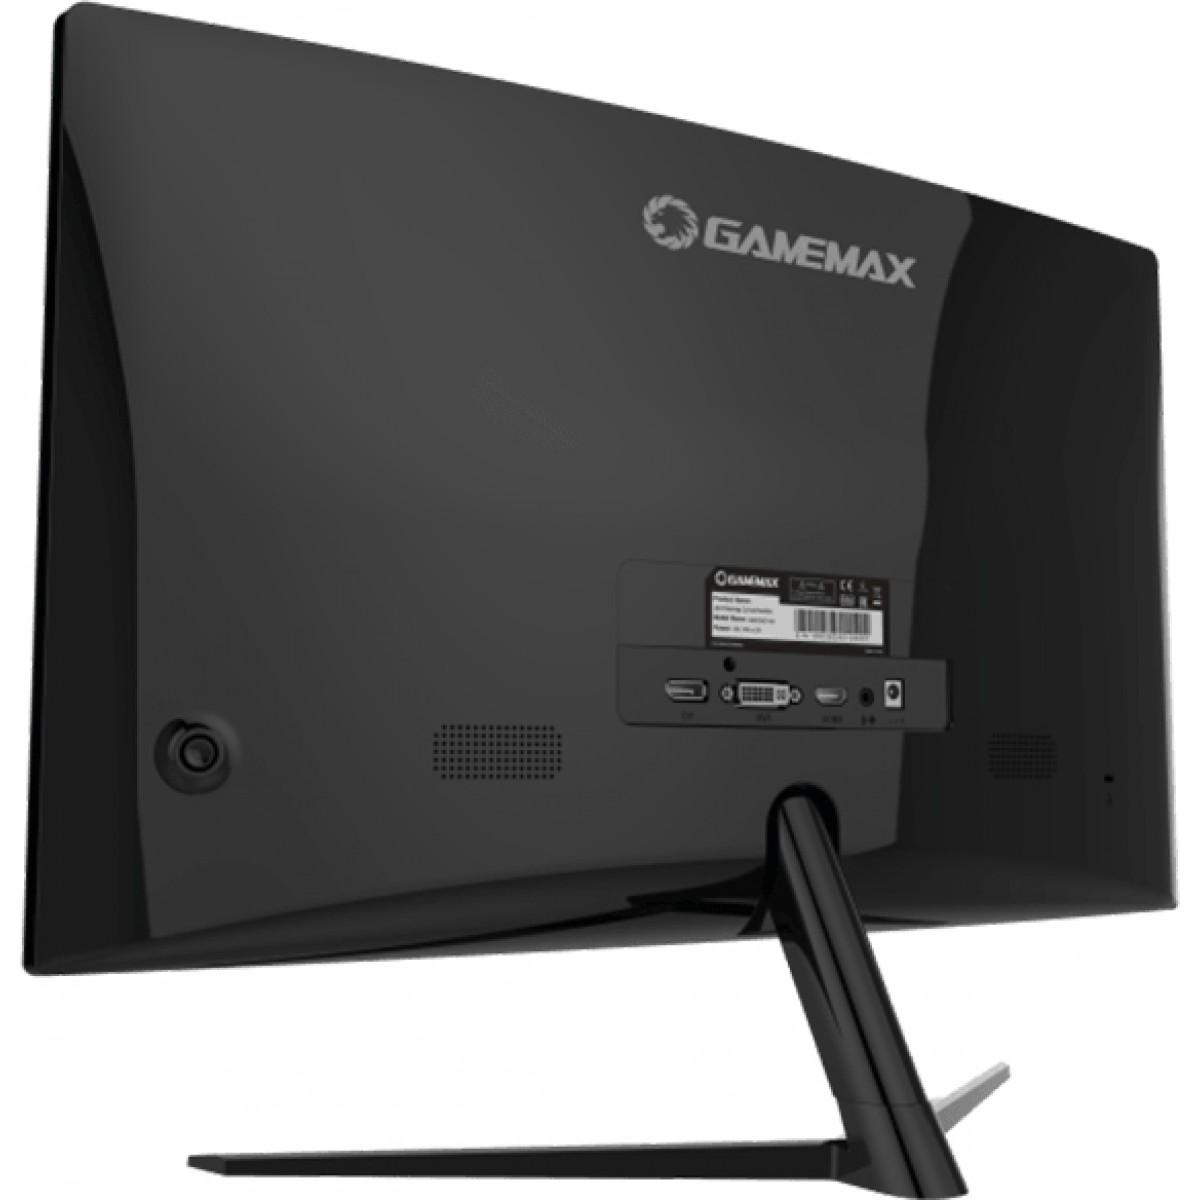 Monitor Gamer GameMax 24 Pol Curvo, Full HD, 144Hz, 1ms, Black, GMX24C144BR